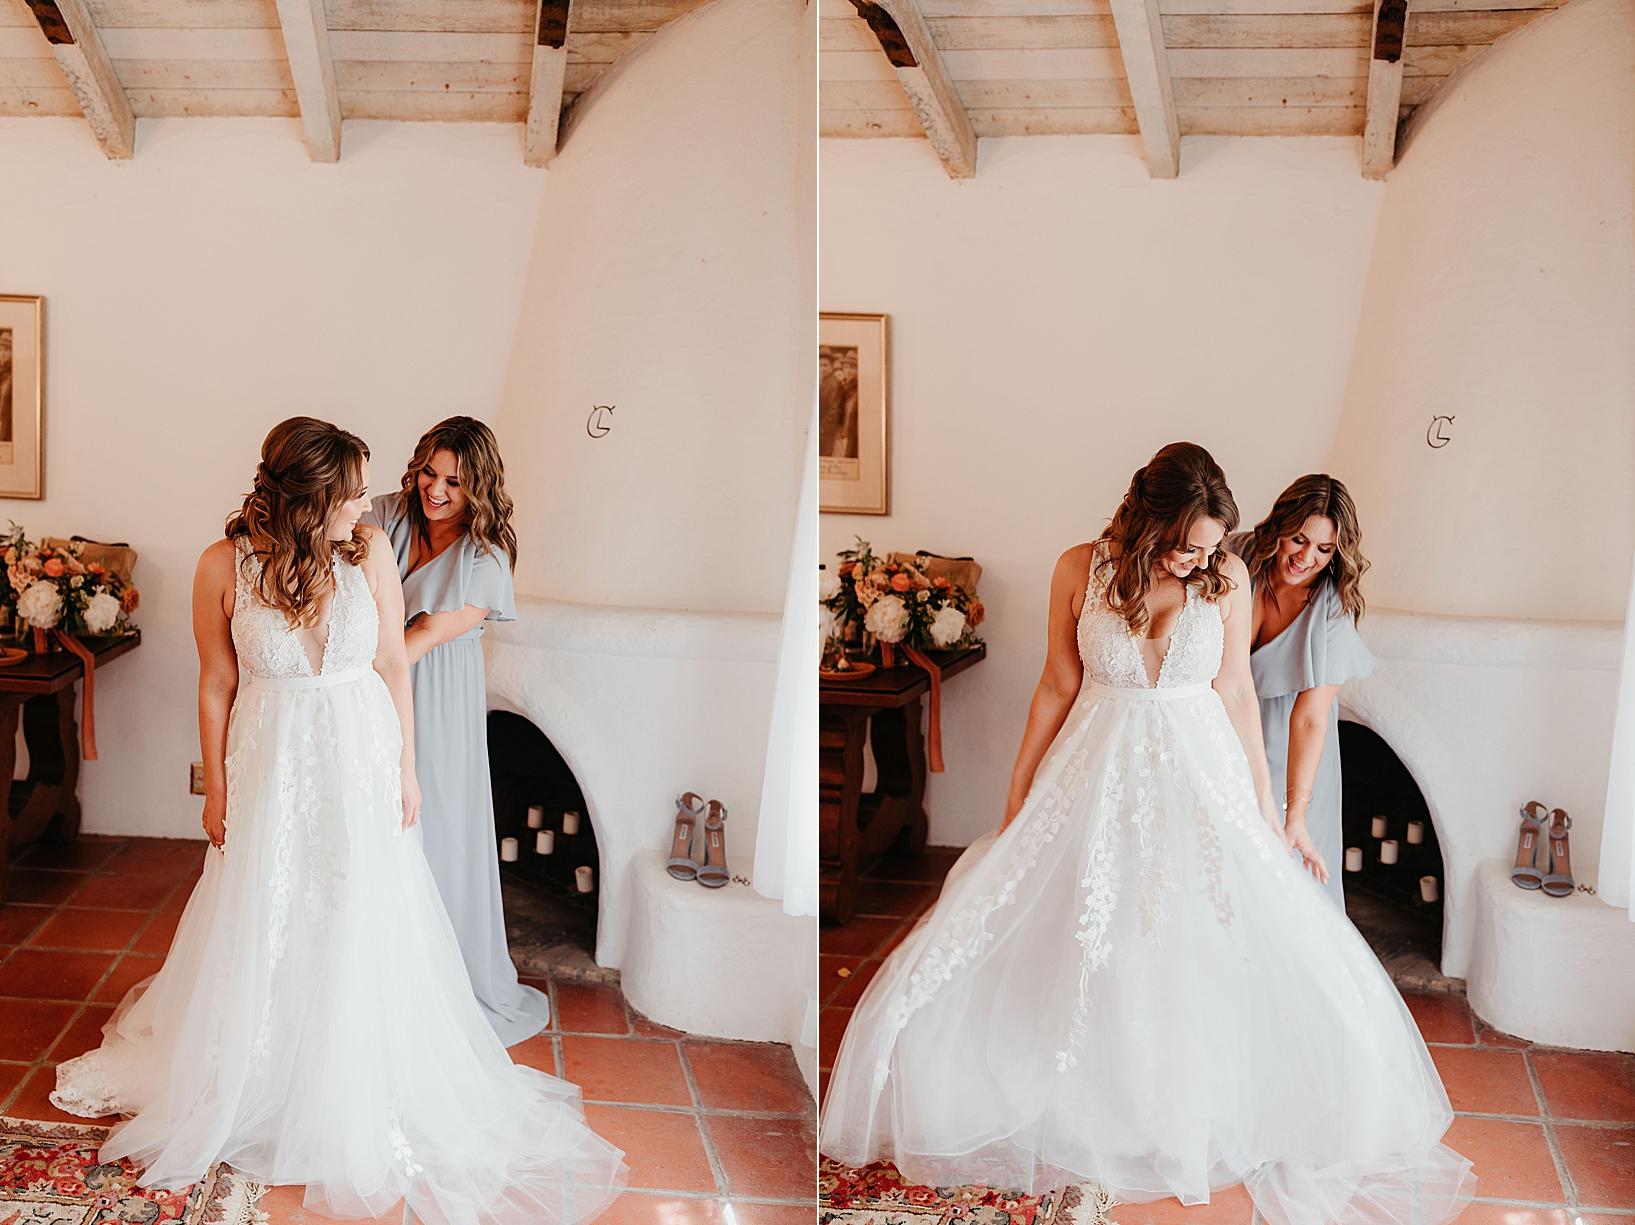 Leo-Carrillo-Ranch-Wedding-14.jpg